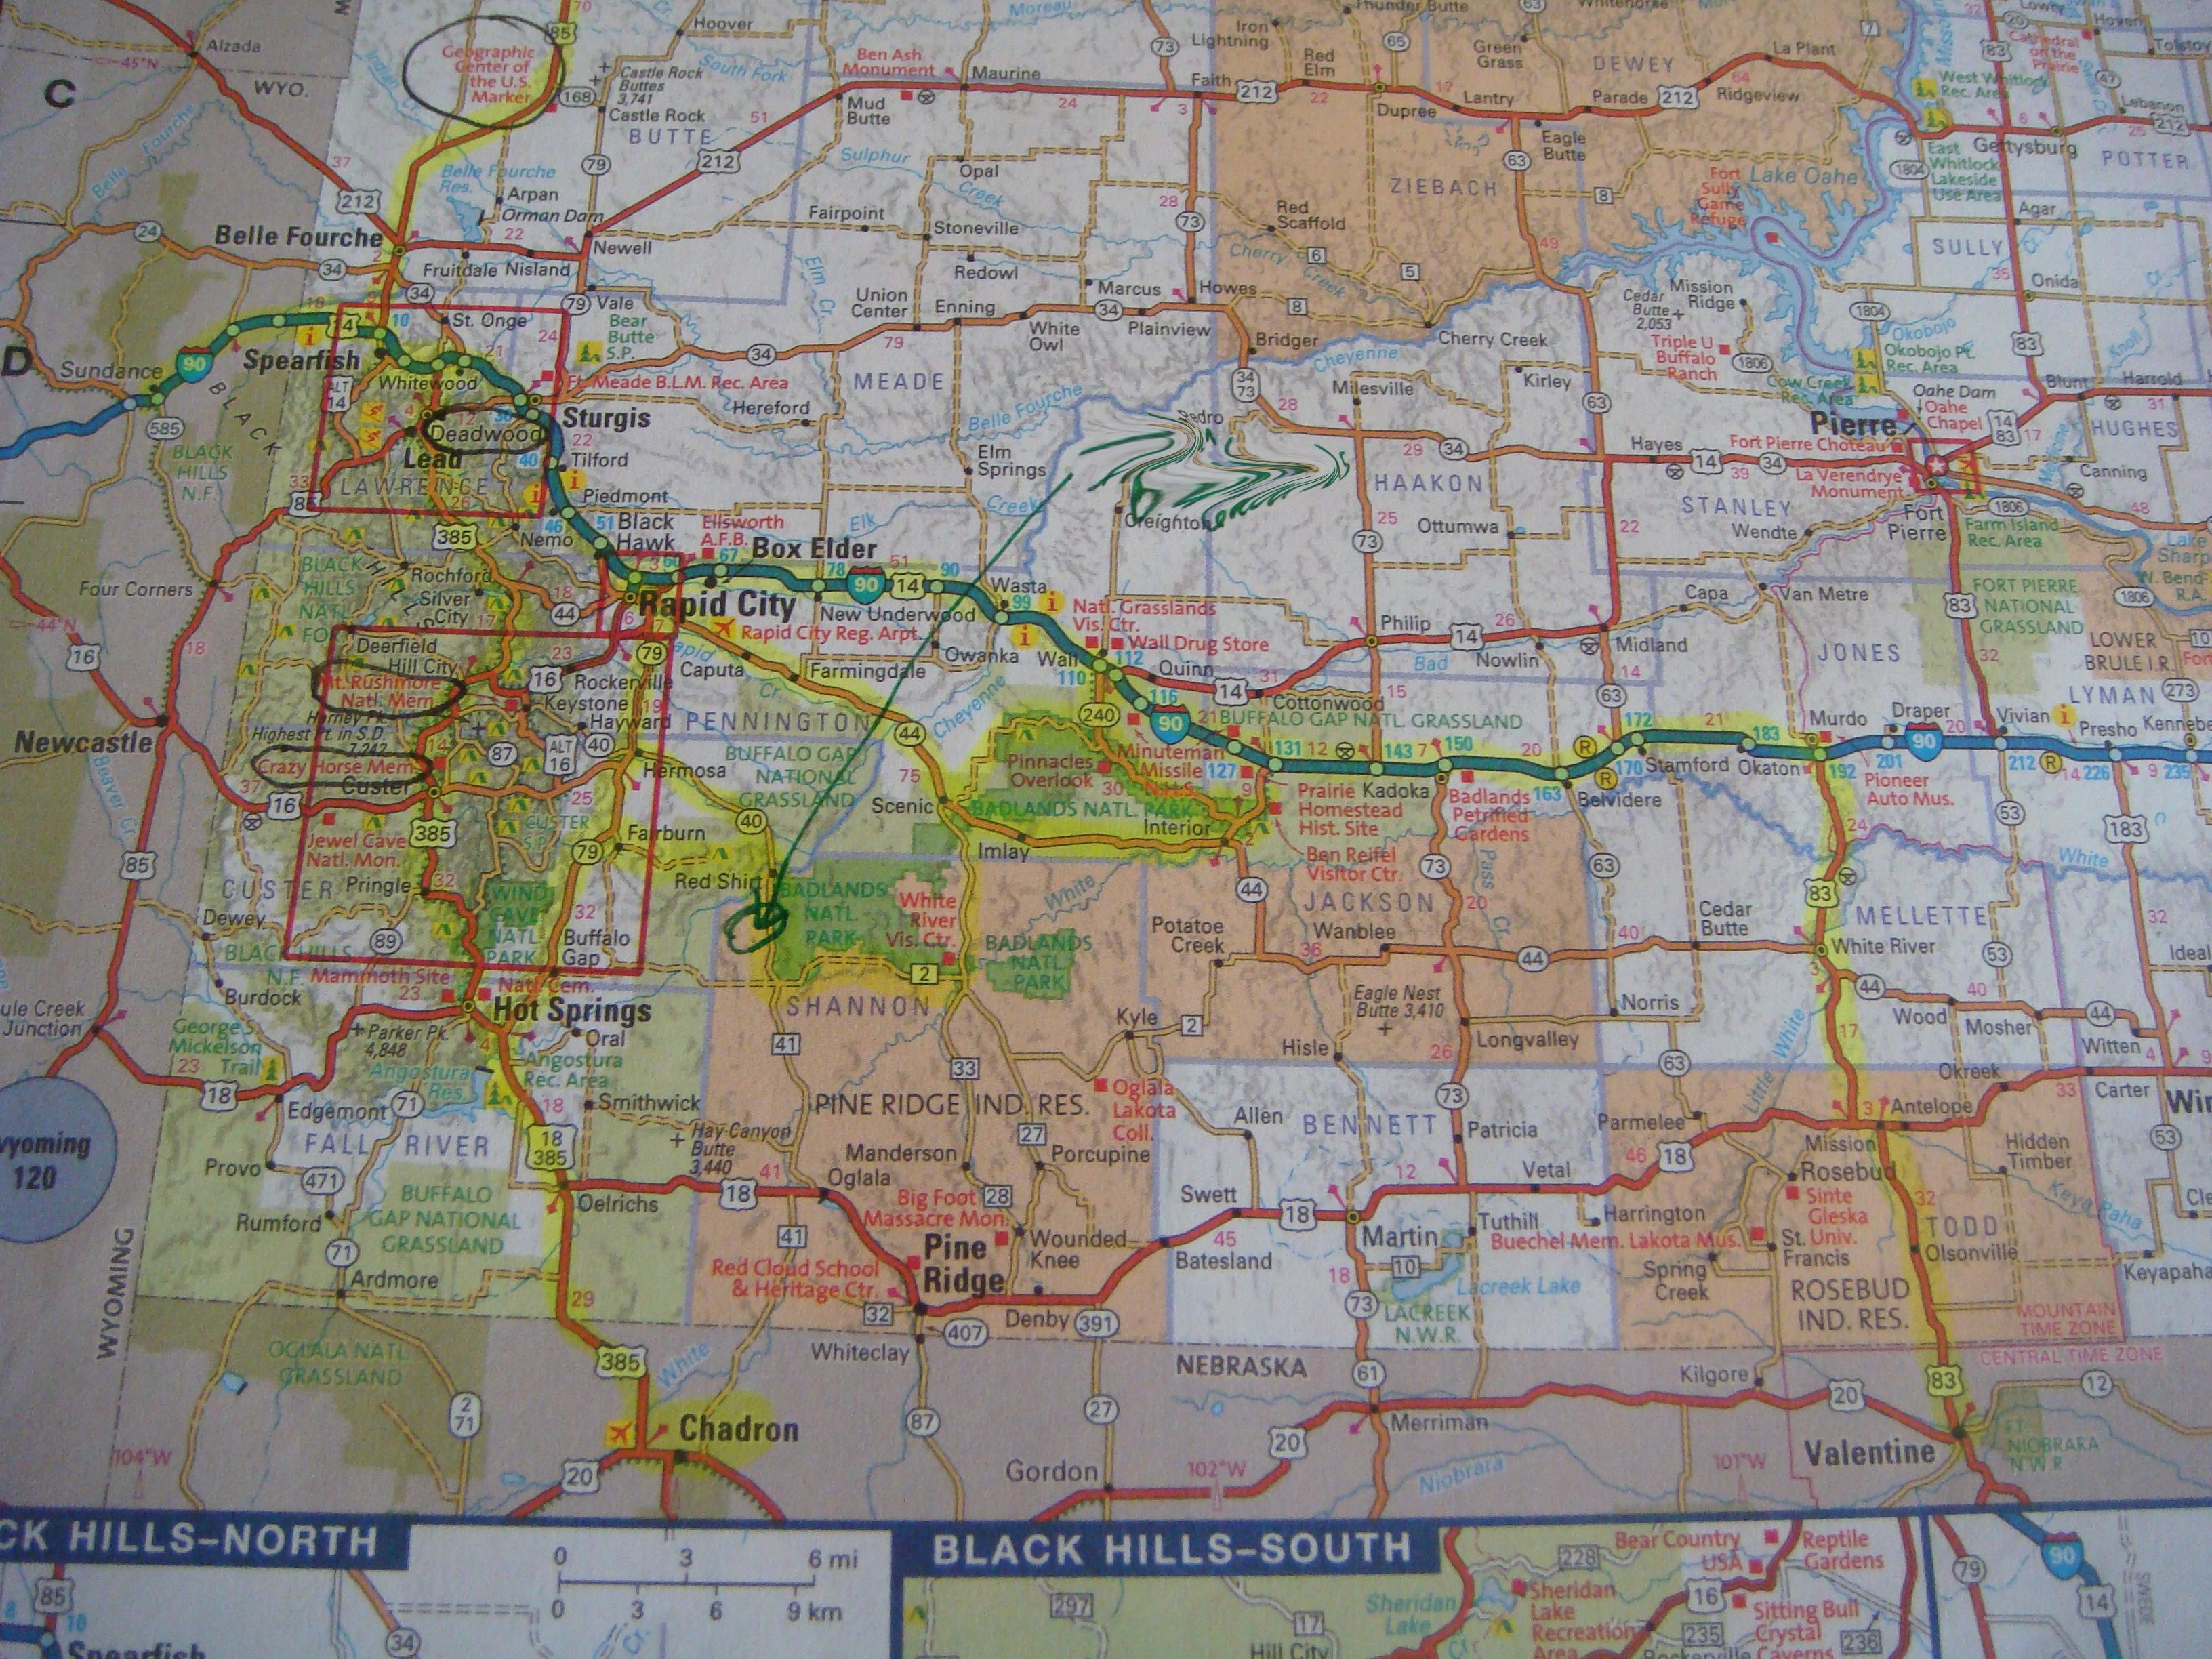 25 memorable sights The Black Hills